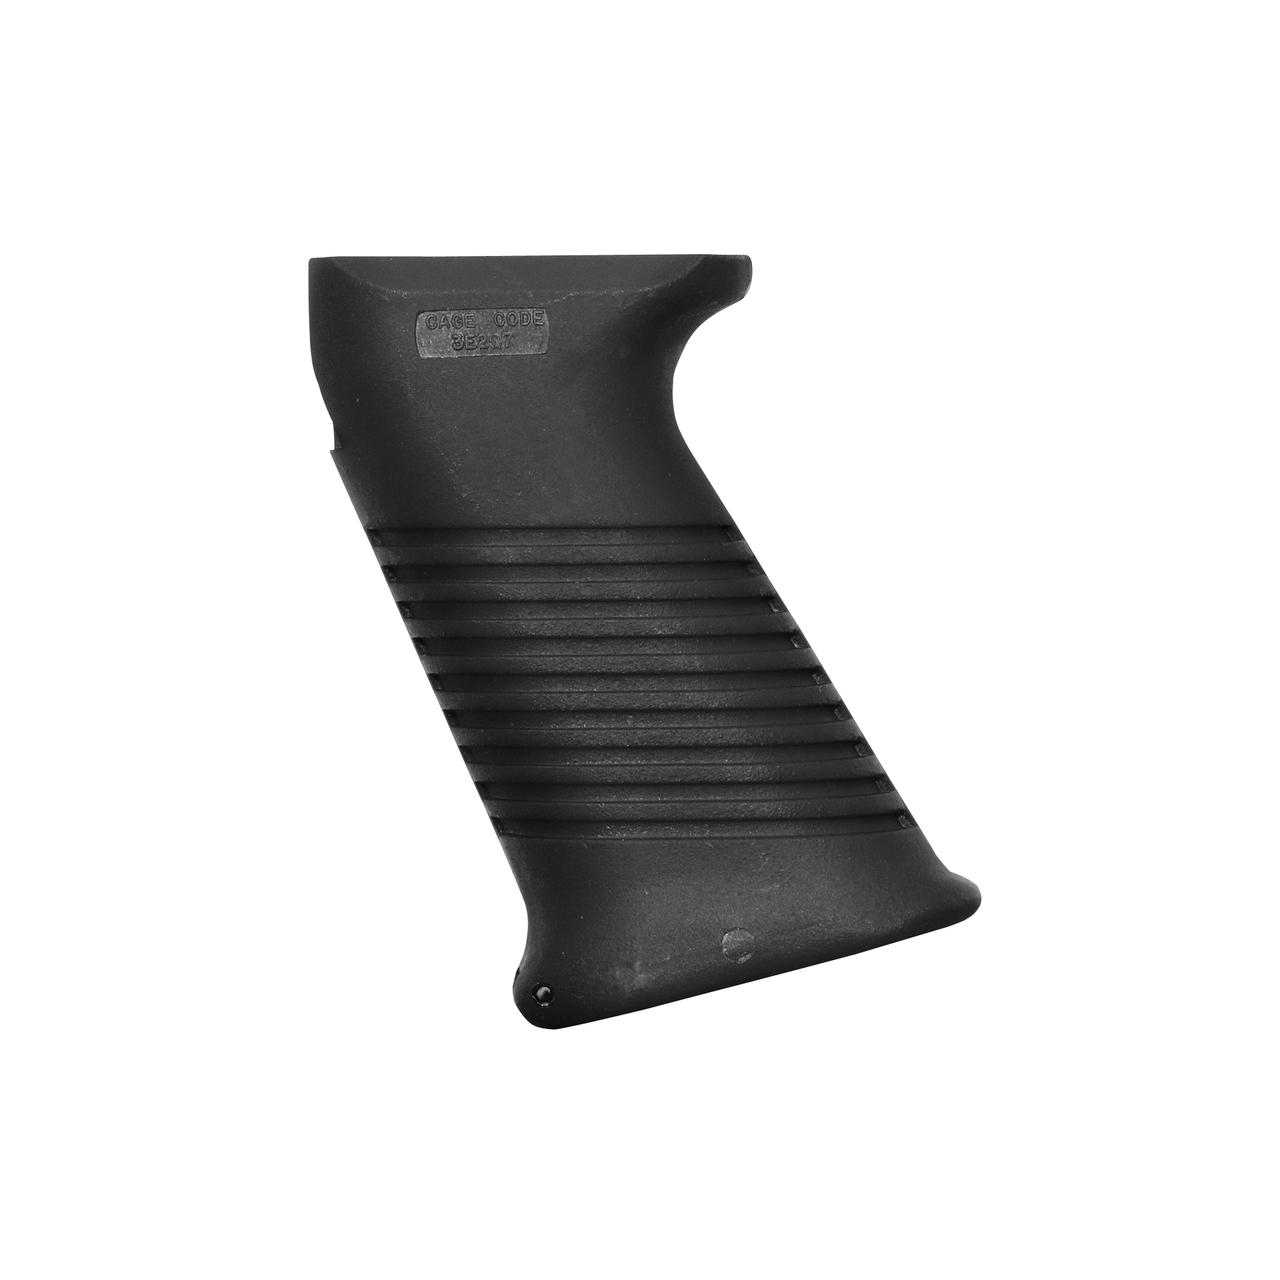 Hogue 74010 5.45 x 39mm Rubber Grip w//Storage Kit Black Rifle